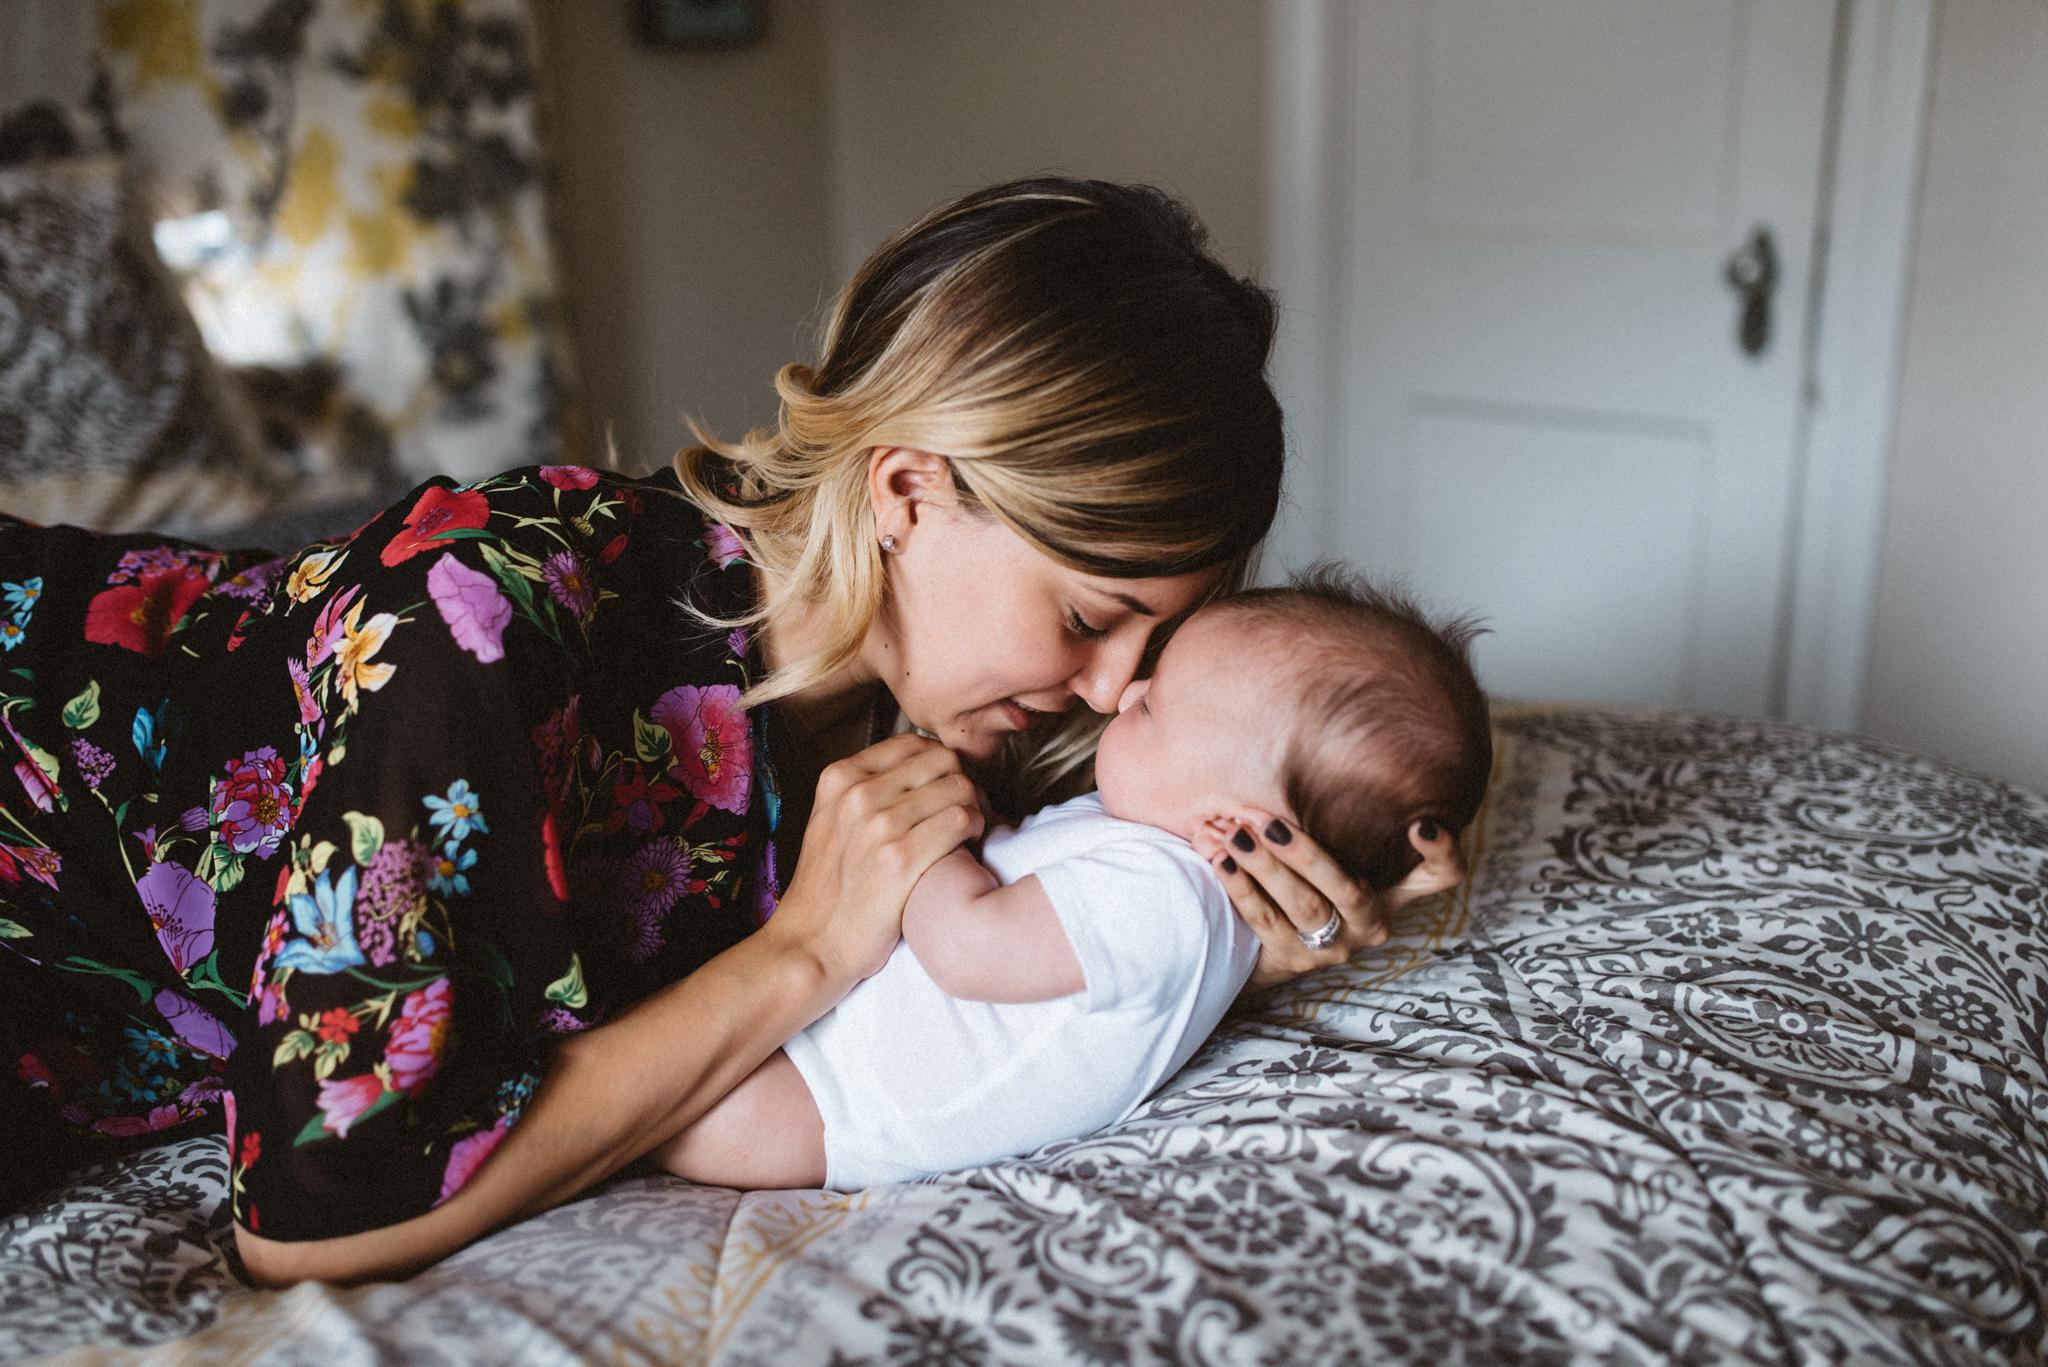 corpus-christi-texas-newborn-photographer-lifestyle-home-session